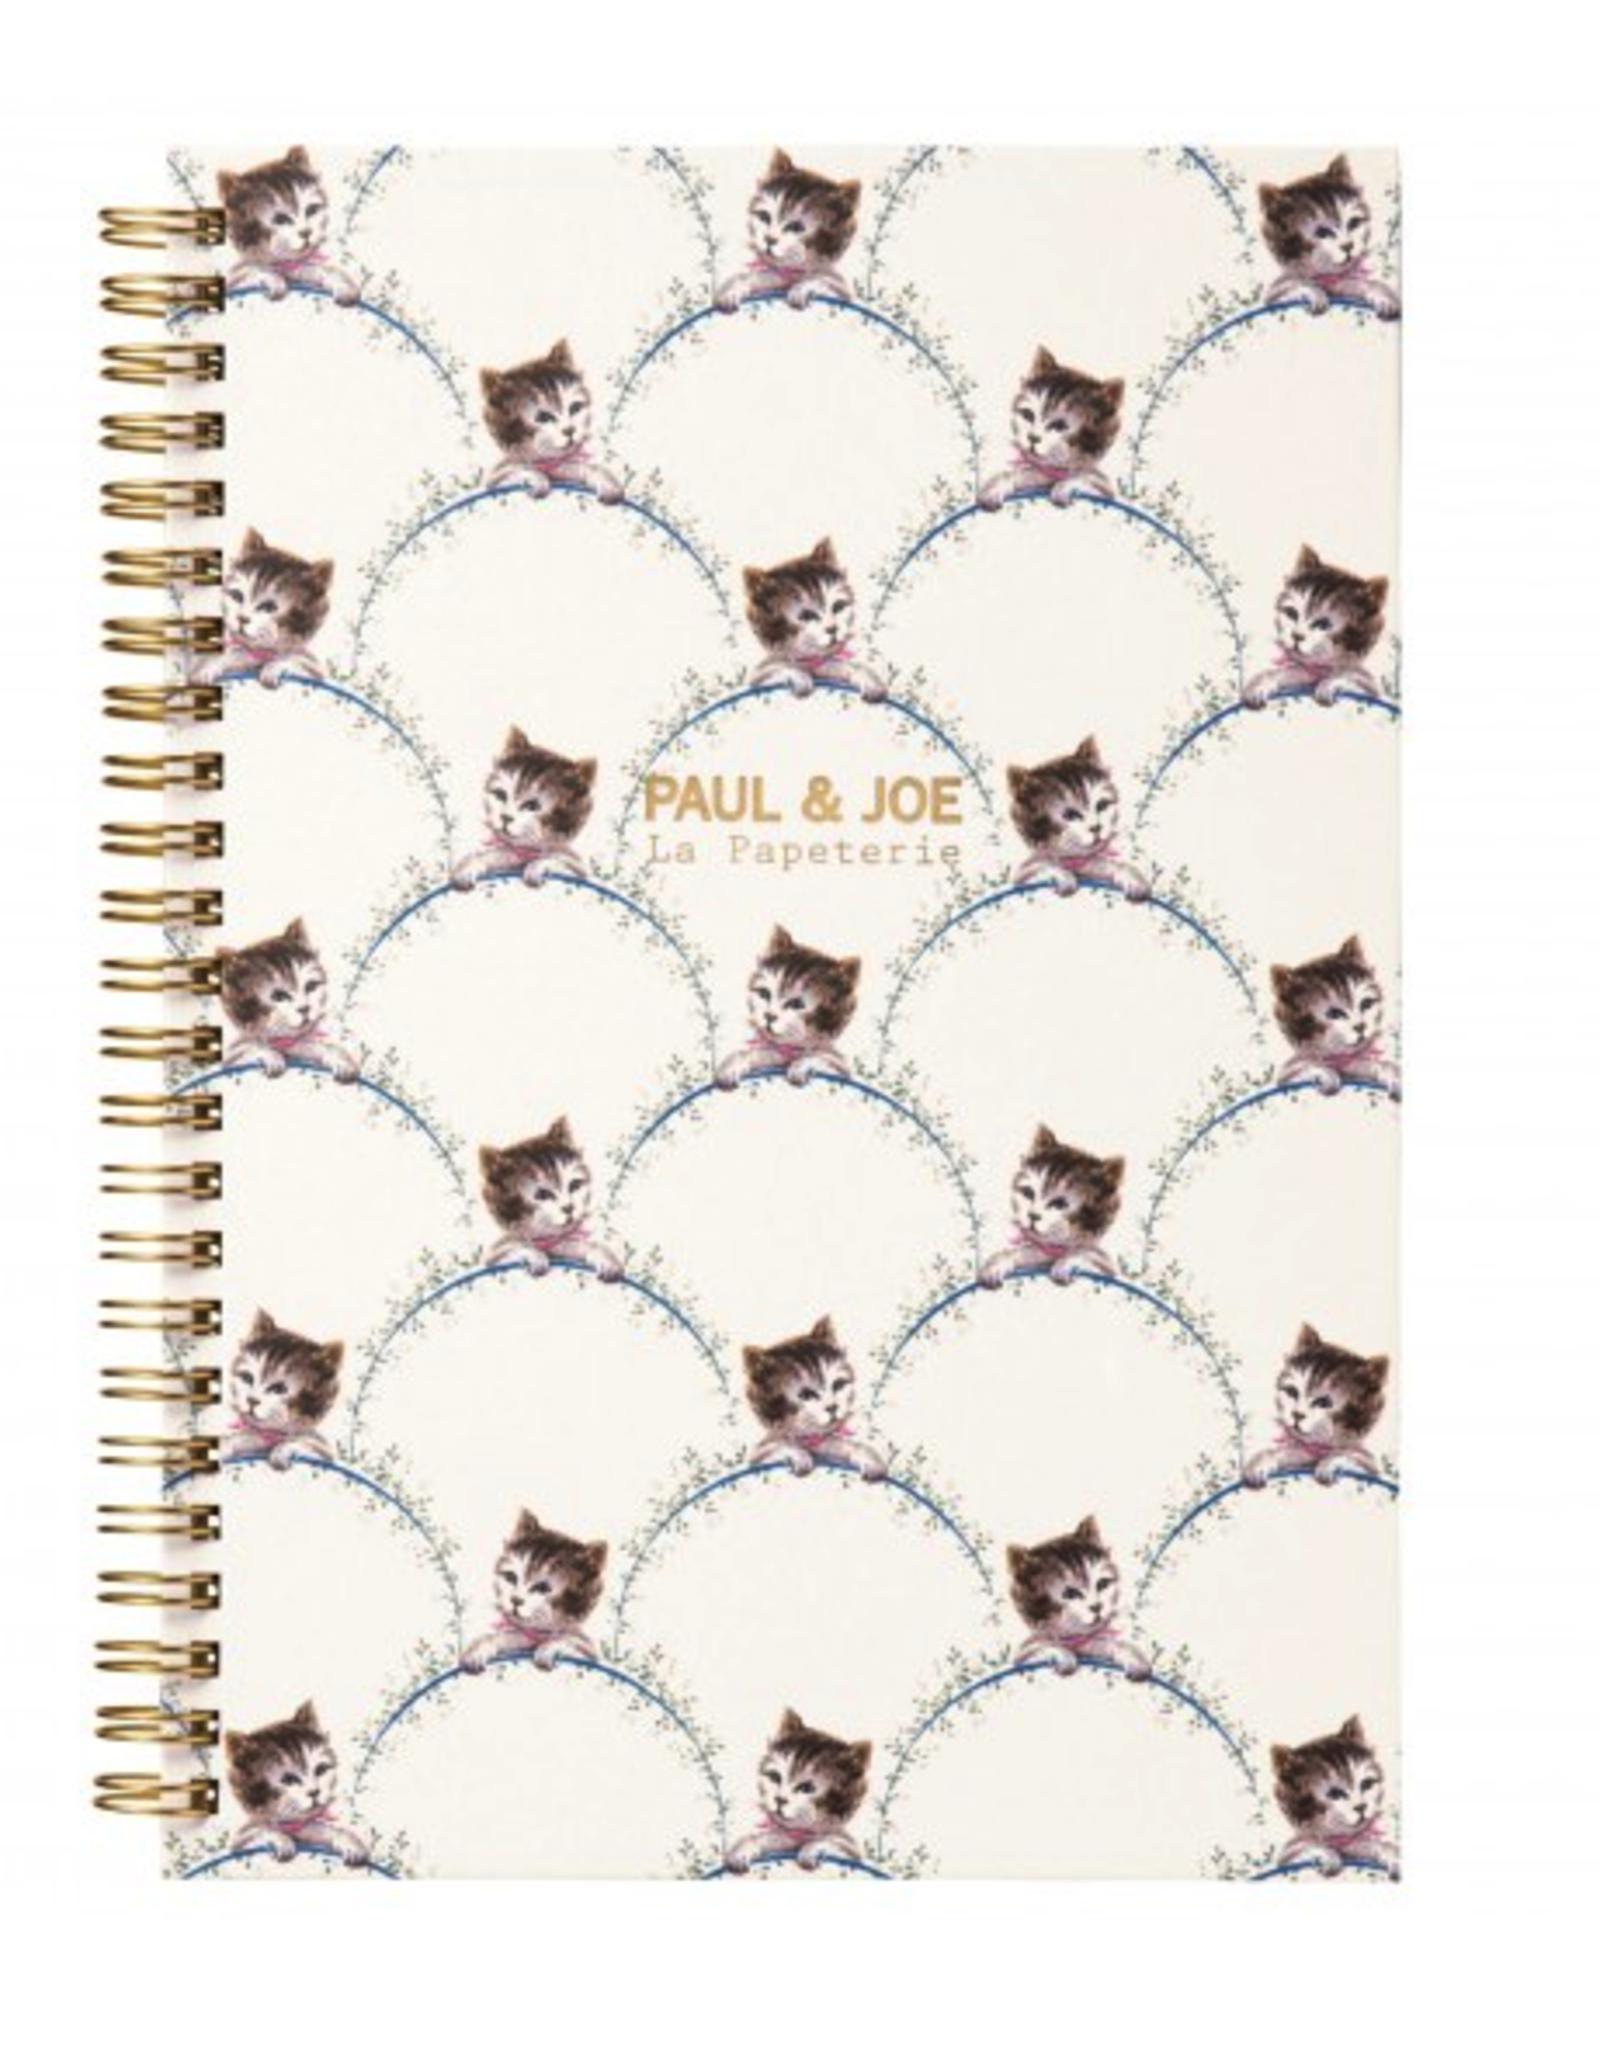 Paul & Joe PAUL & JOE - Spiraal Notebook A5 - Bladeren getekend kattenhoofd